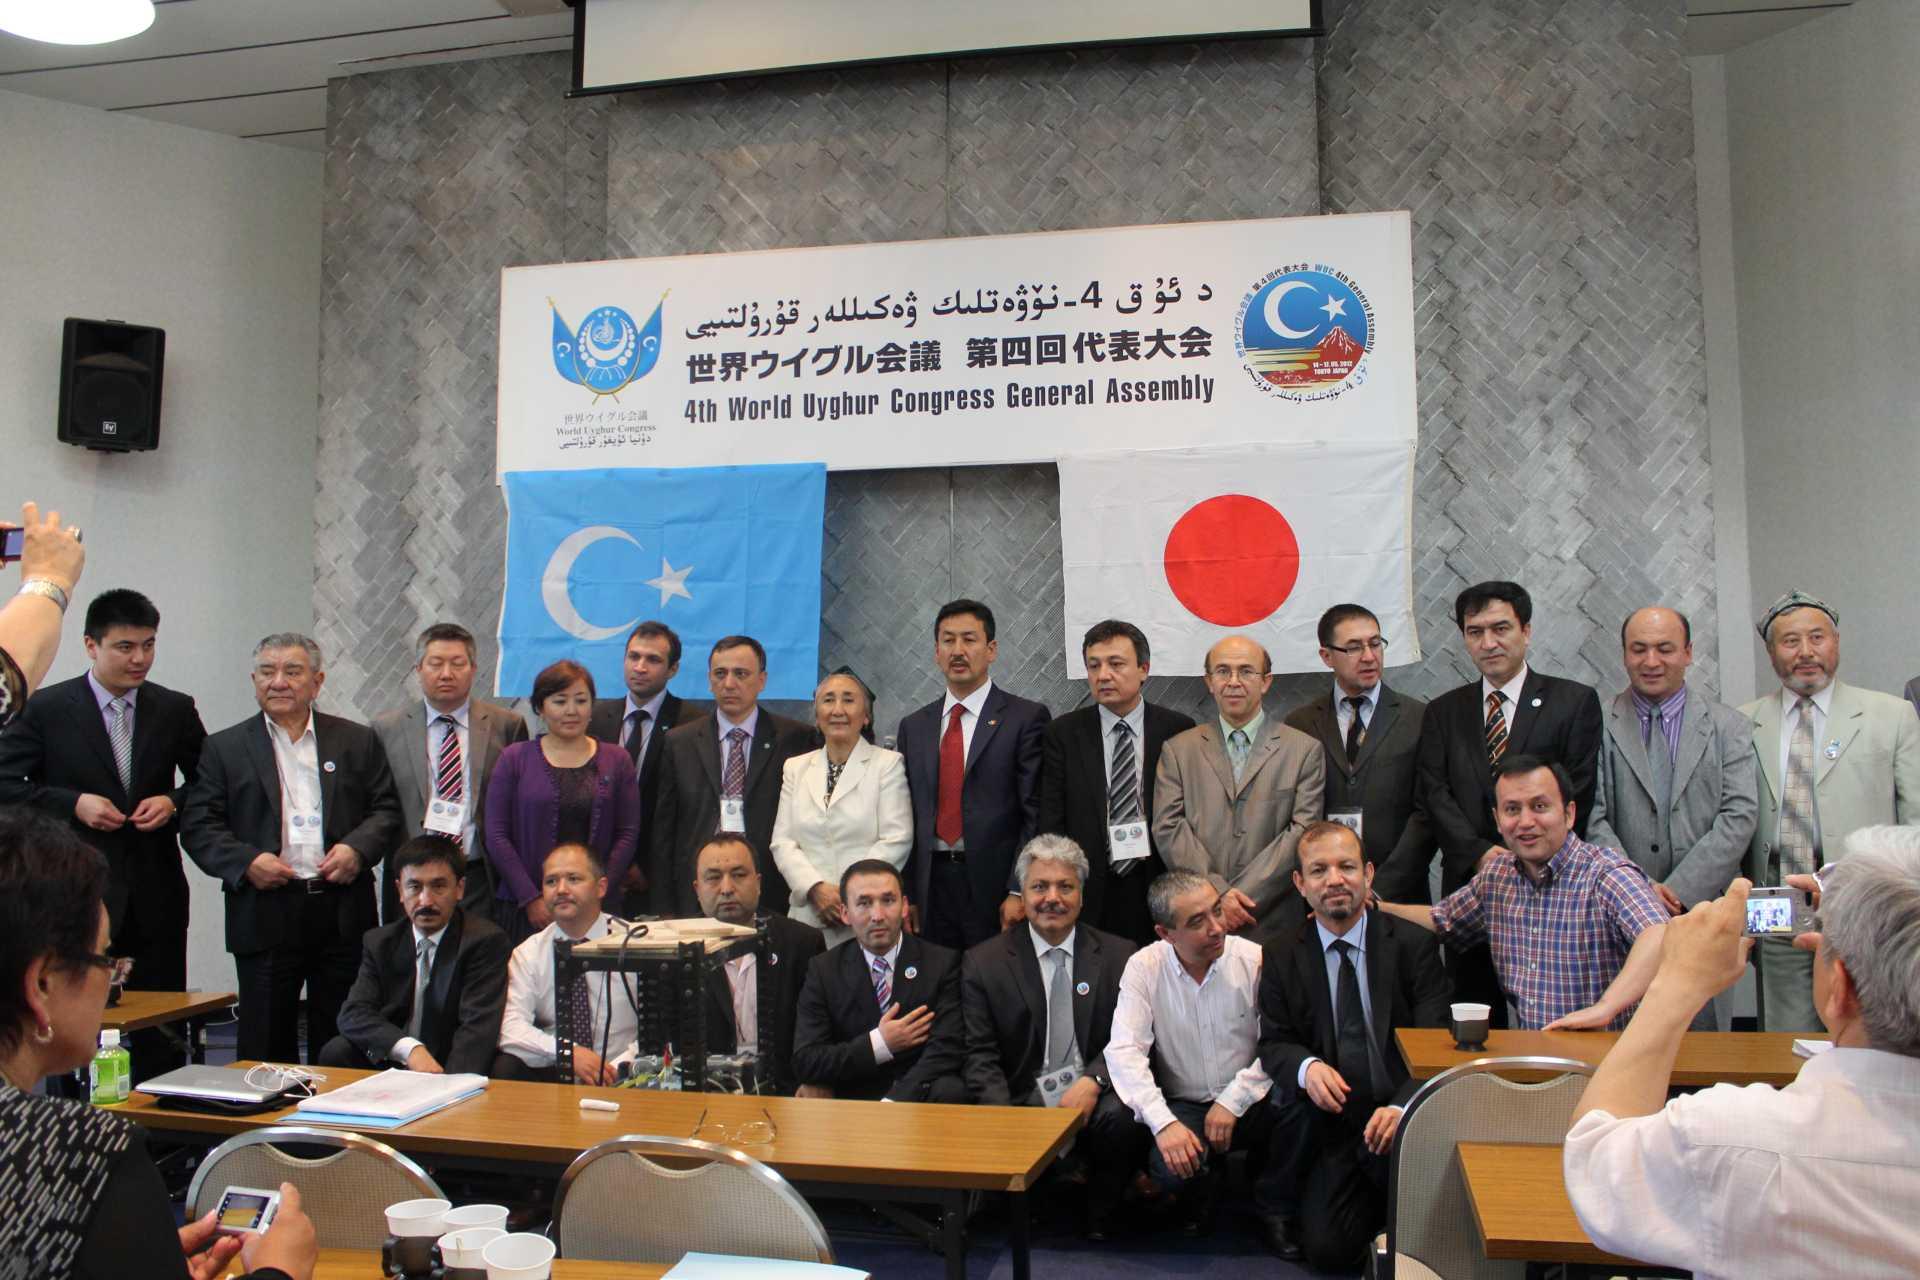 Hope In Burma >> uyghur congress-4thGM